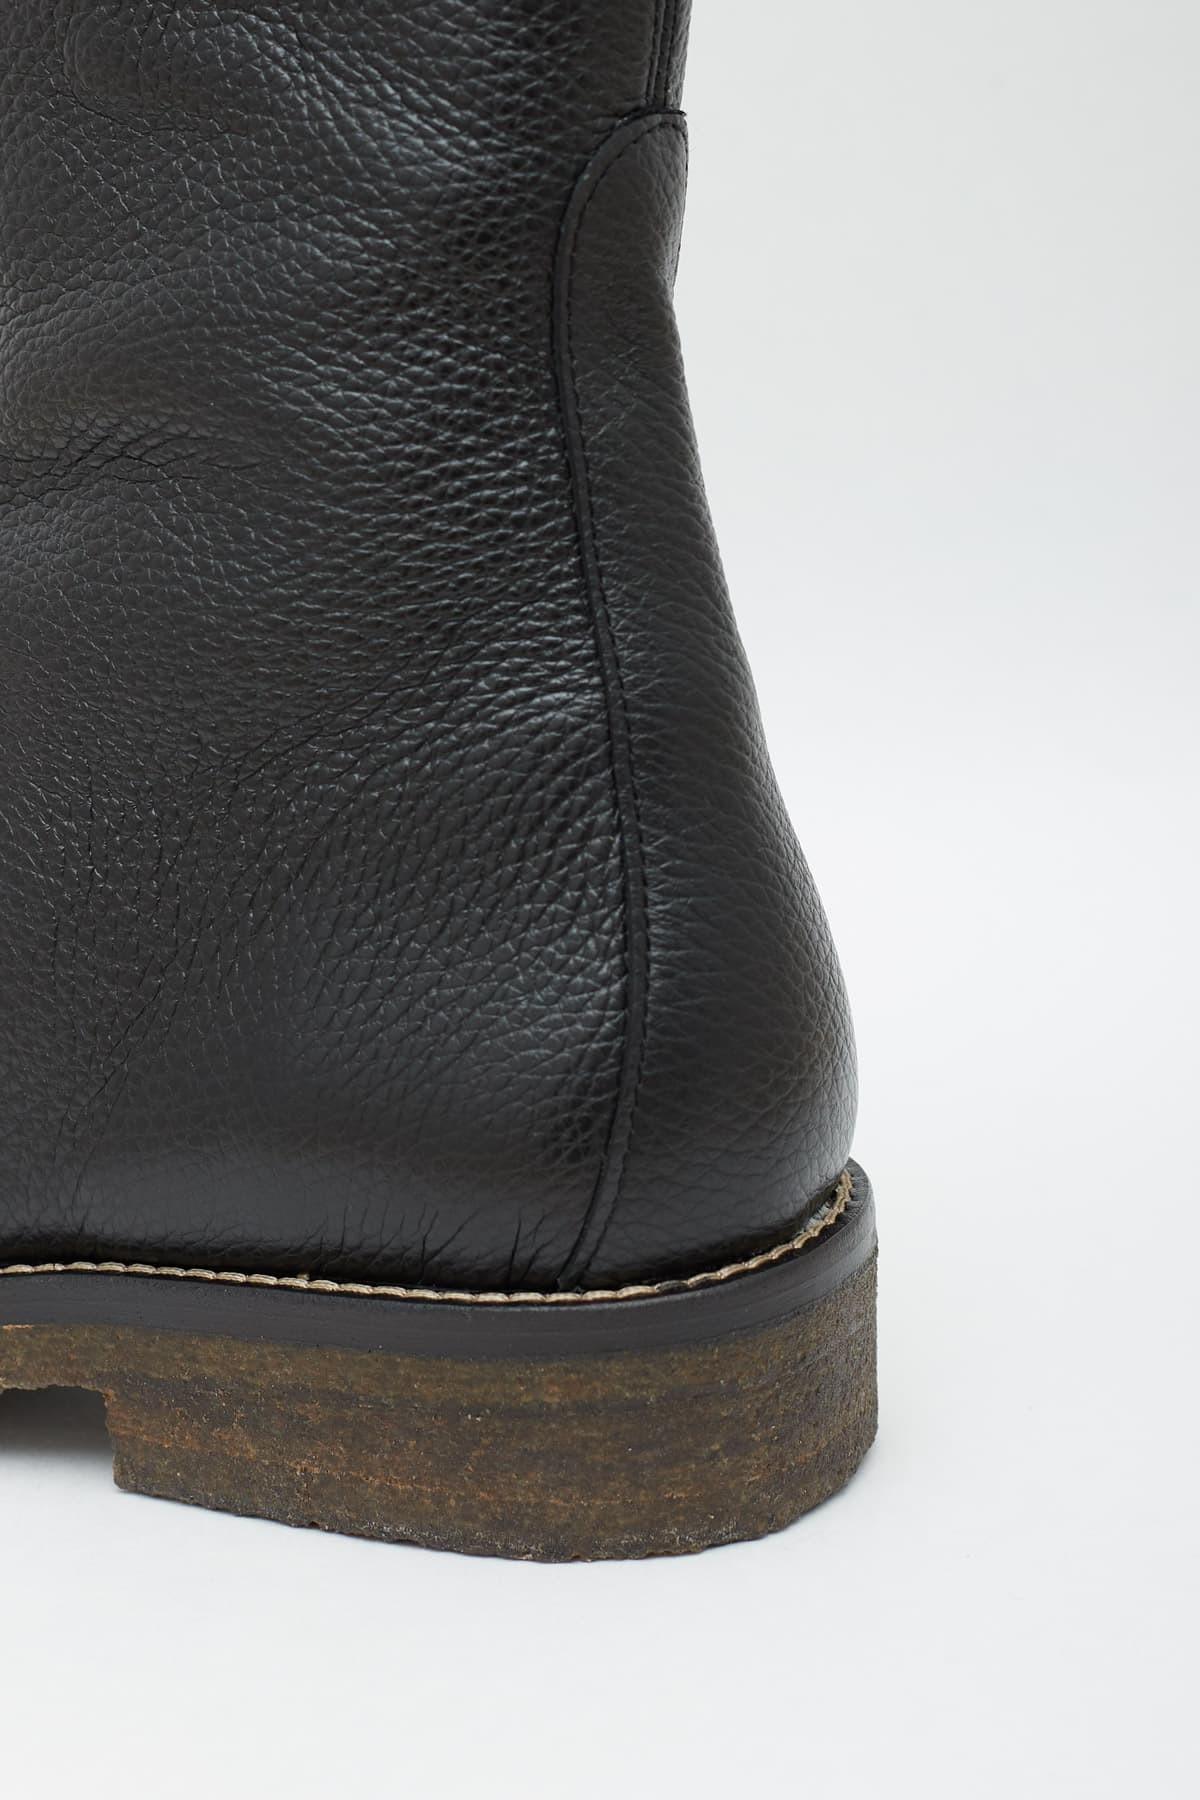 Shop Telfar Pool Blue Small Shopper Bag